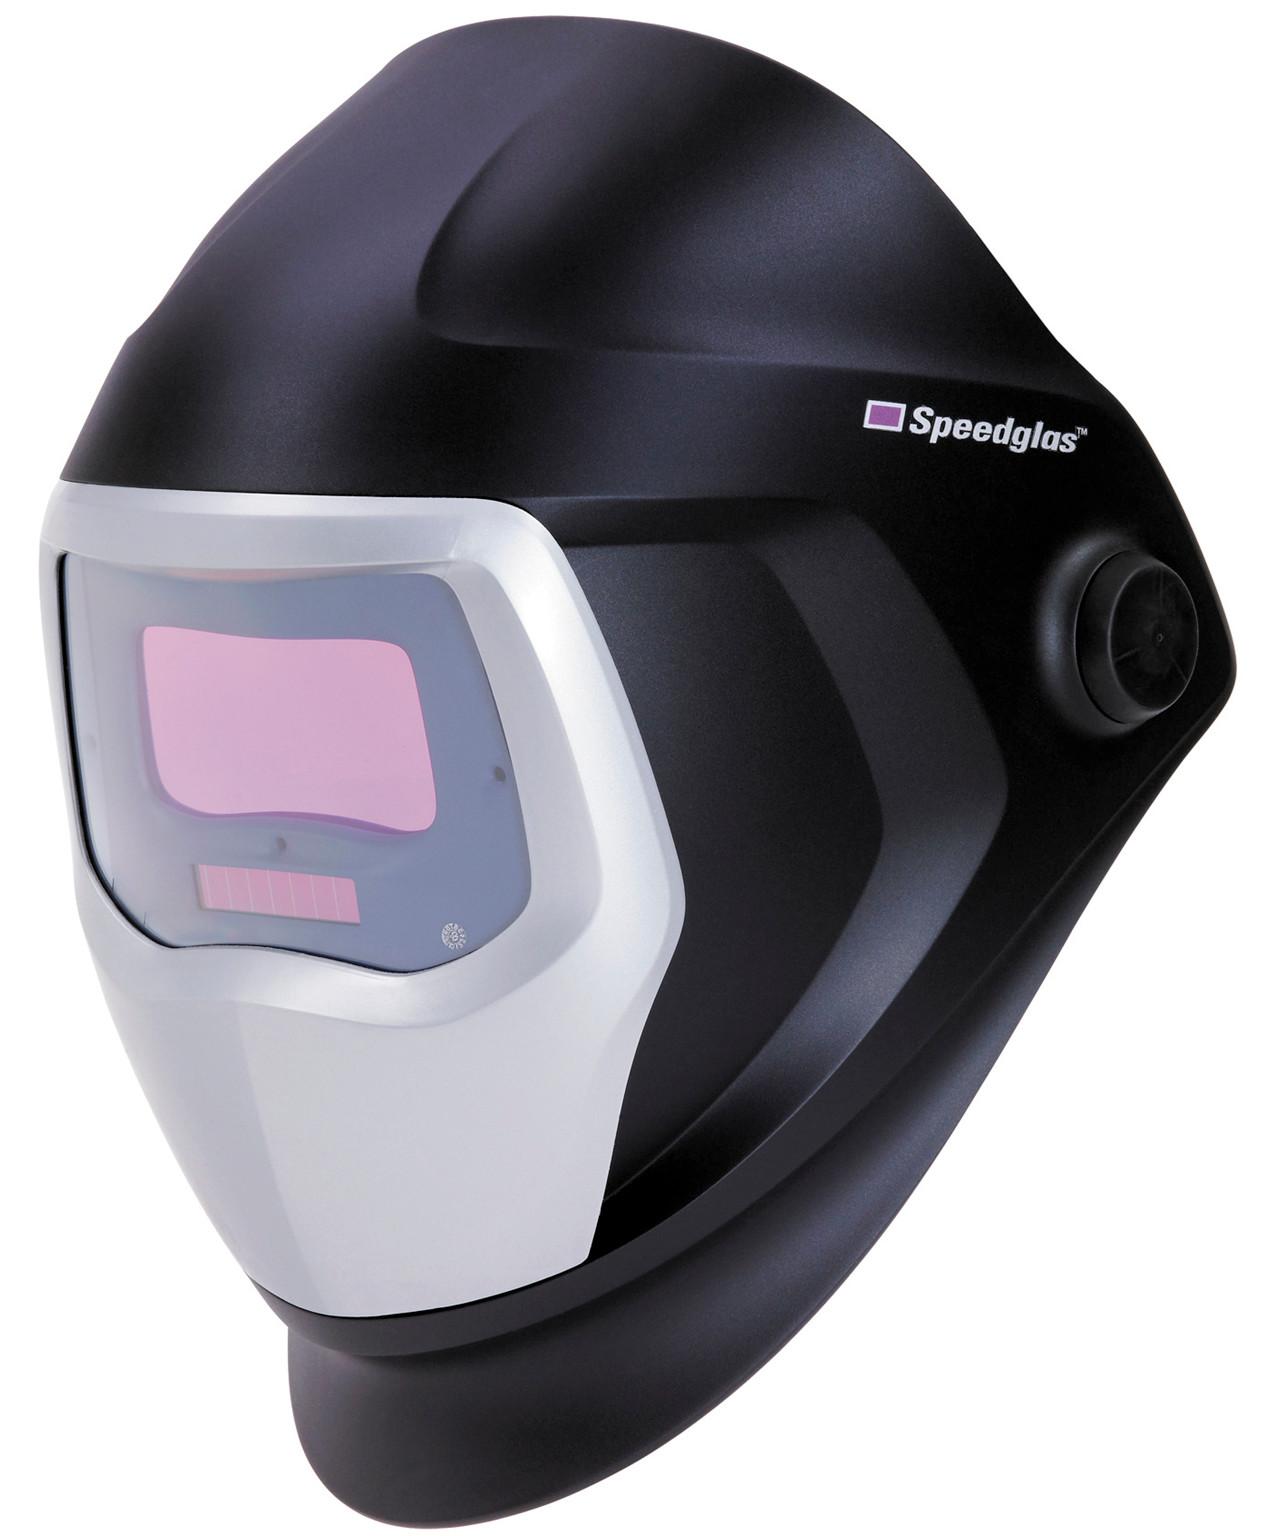 3395cd67a 3M Speedglas 9100X svejsehjelm